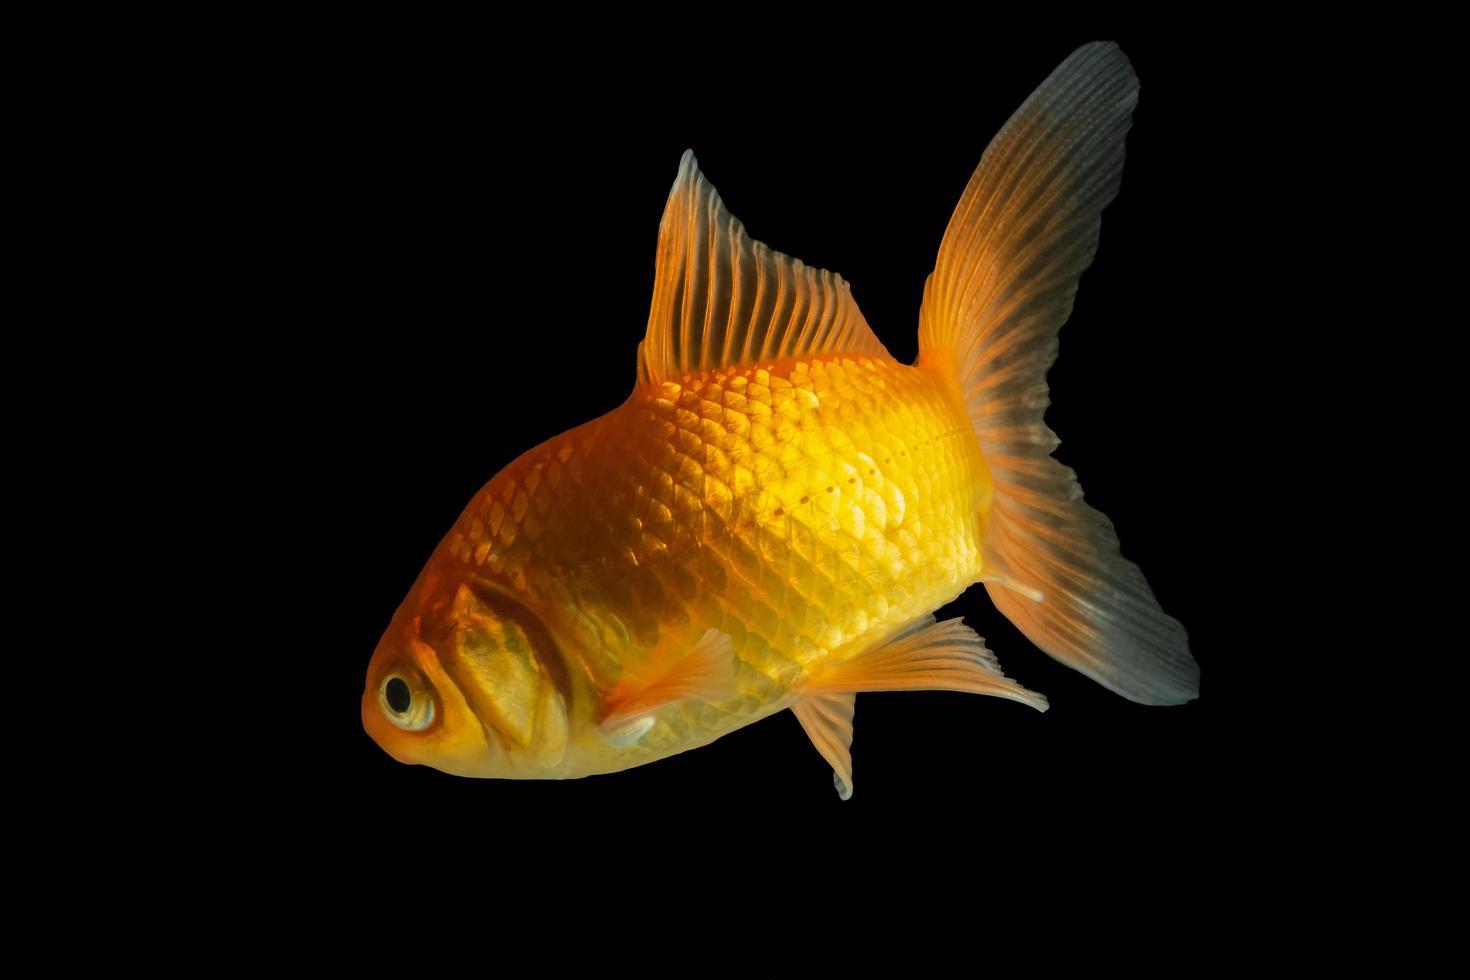 Carp Golden fish on black background photo